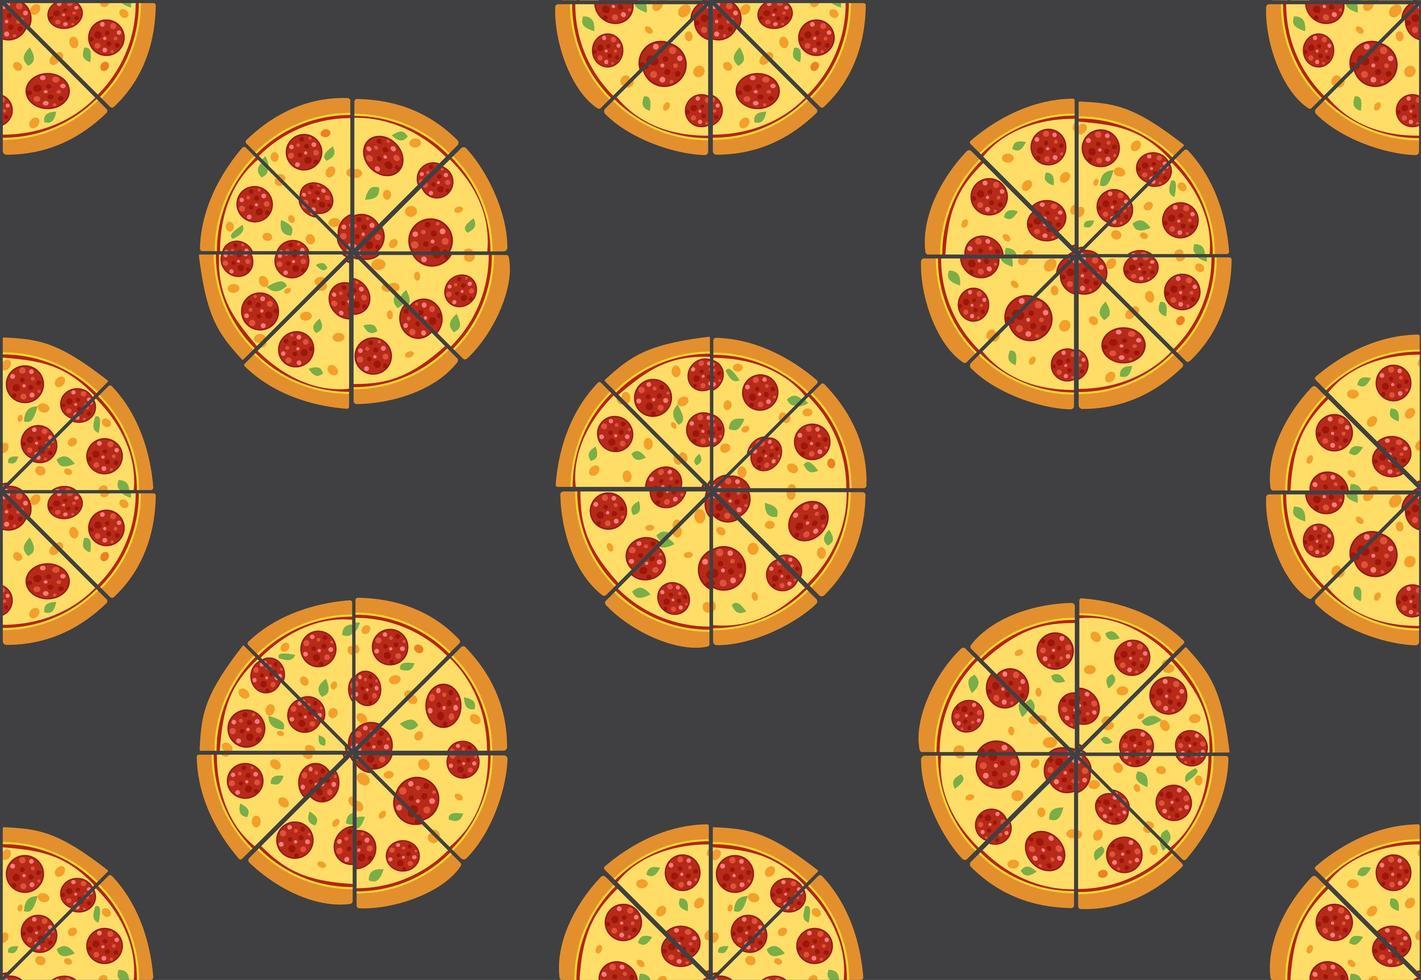 Seamless mönster av pizza isolerad på svart bakgrund vektor